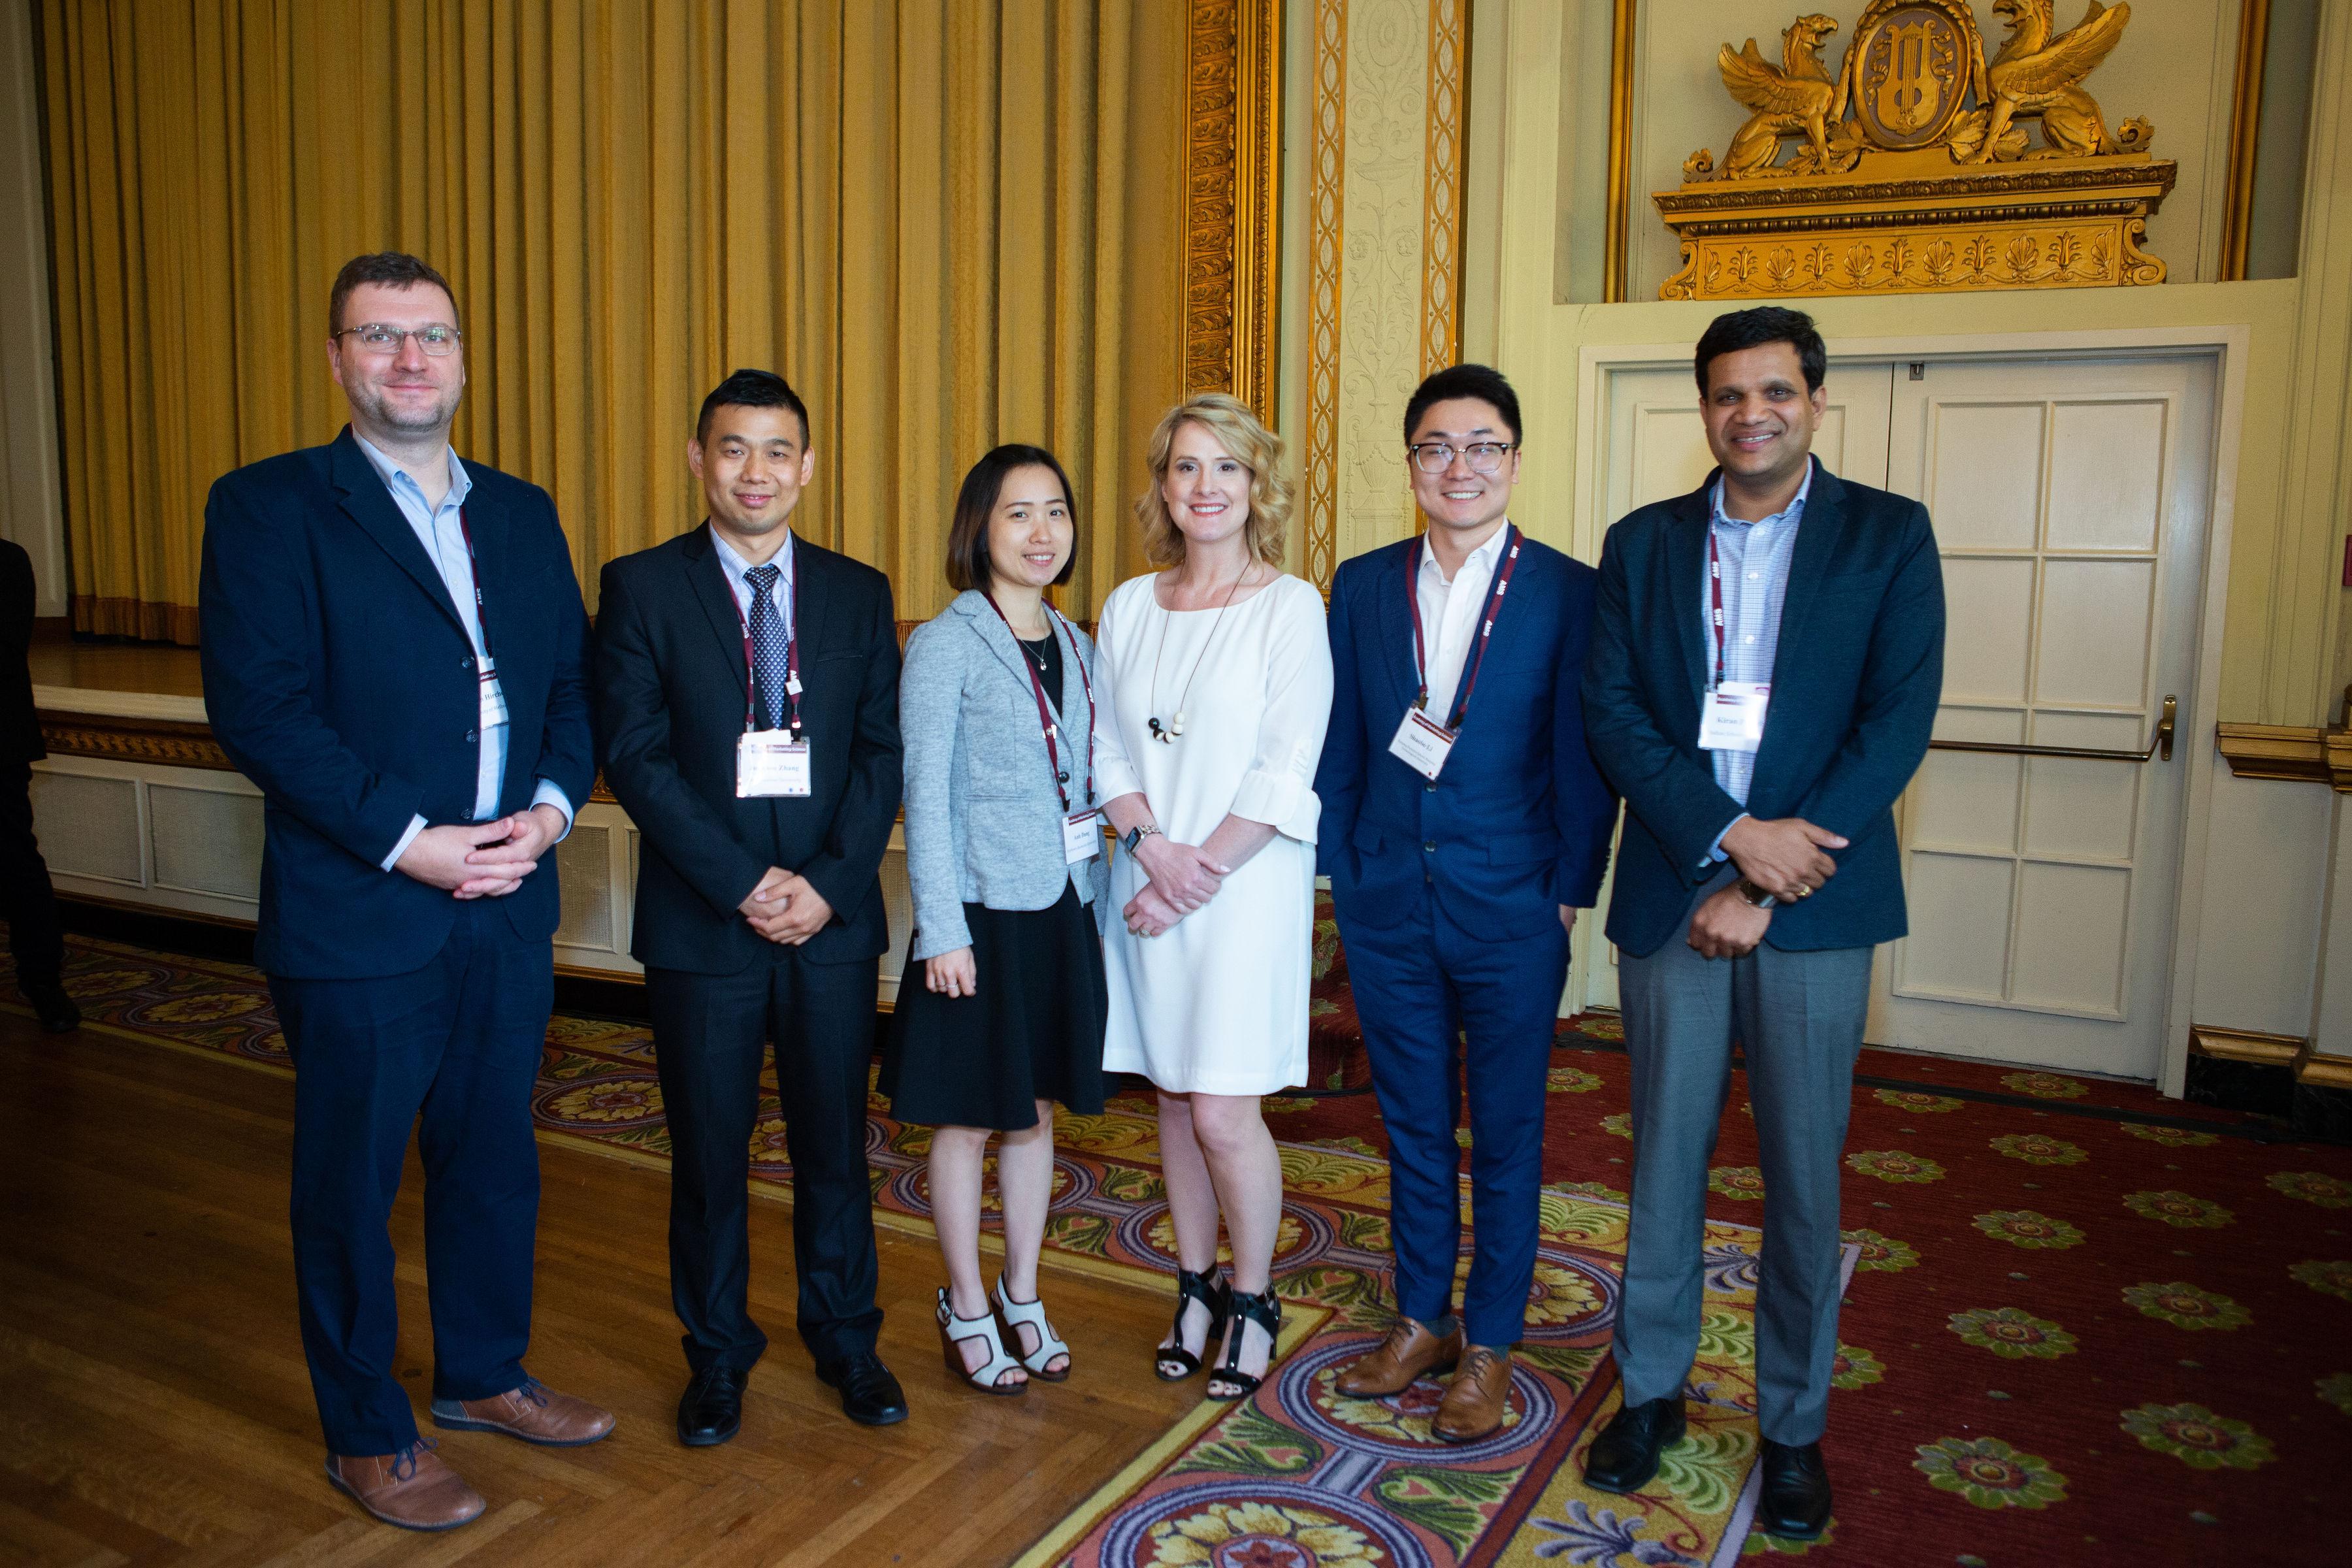 Mary Kay Awards Doctoral Dissertation Awards at 2019 Academy